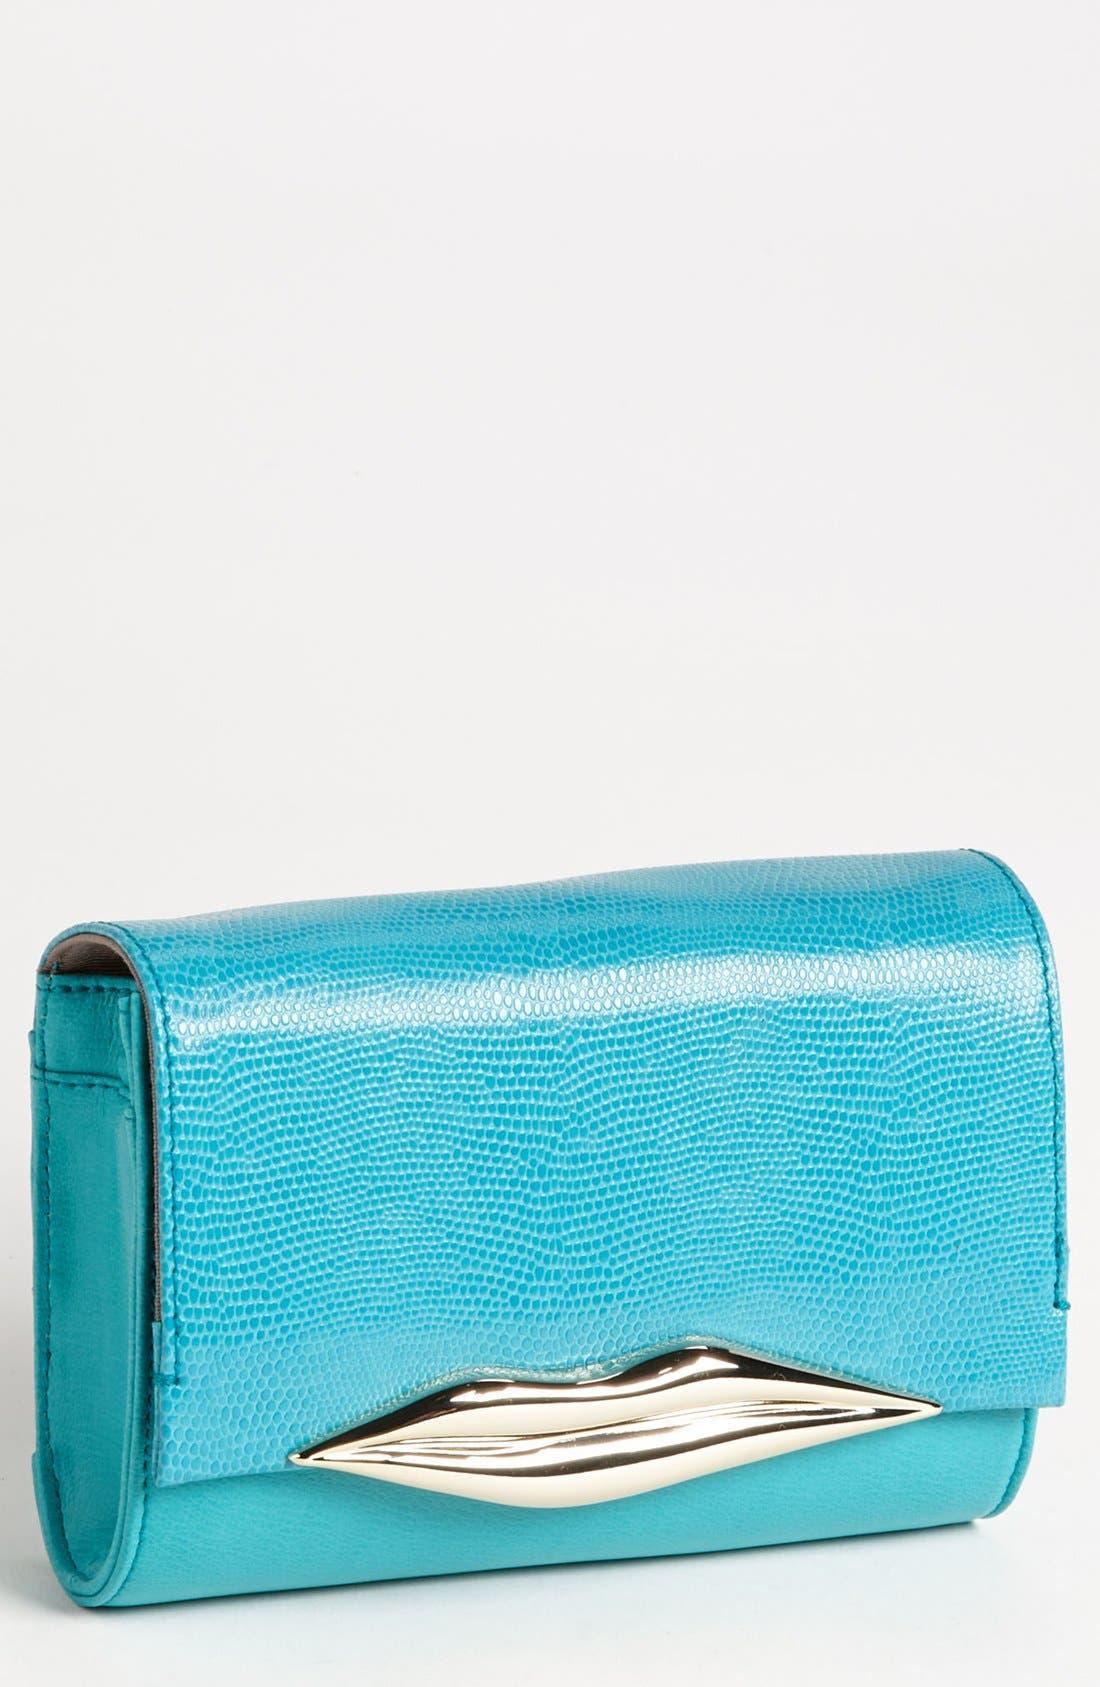 Alternate Image 1 Selected - Diane von Furstenberg 'Lips - Mini' Embossed Leather Clutch